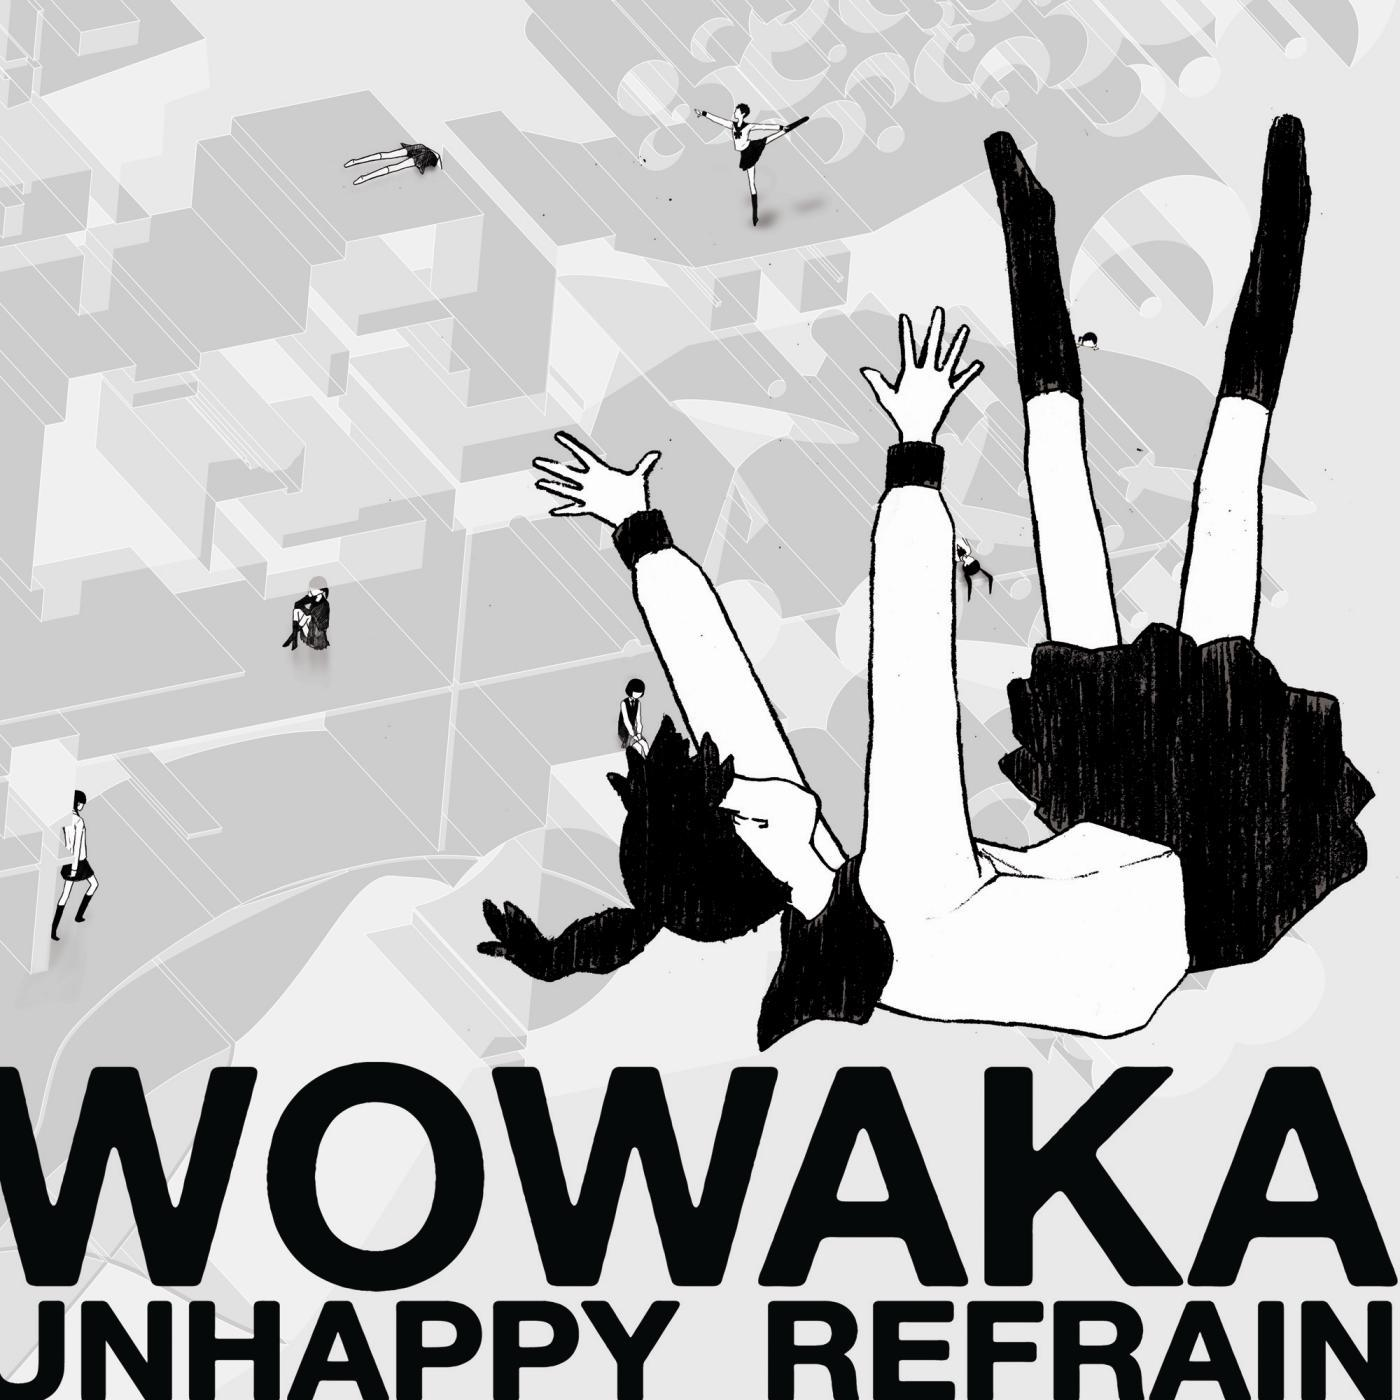 [WOWAKA] [628MB] アンハッピーリフレイン / UNHAPPY REFRAIN [FLAC 44.1kHz/16bit]